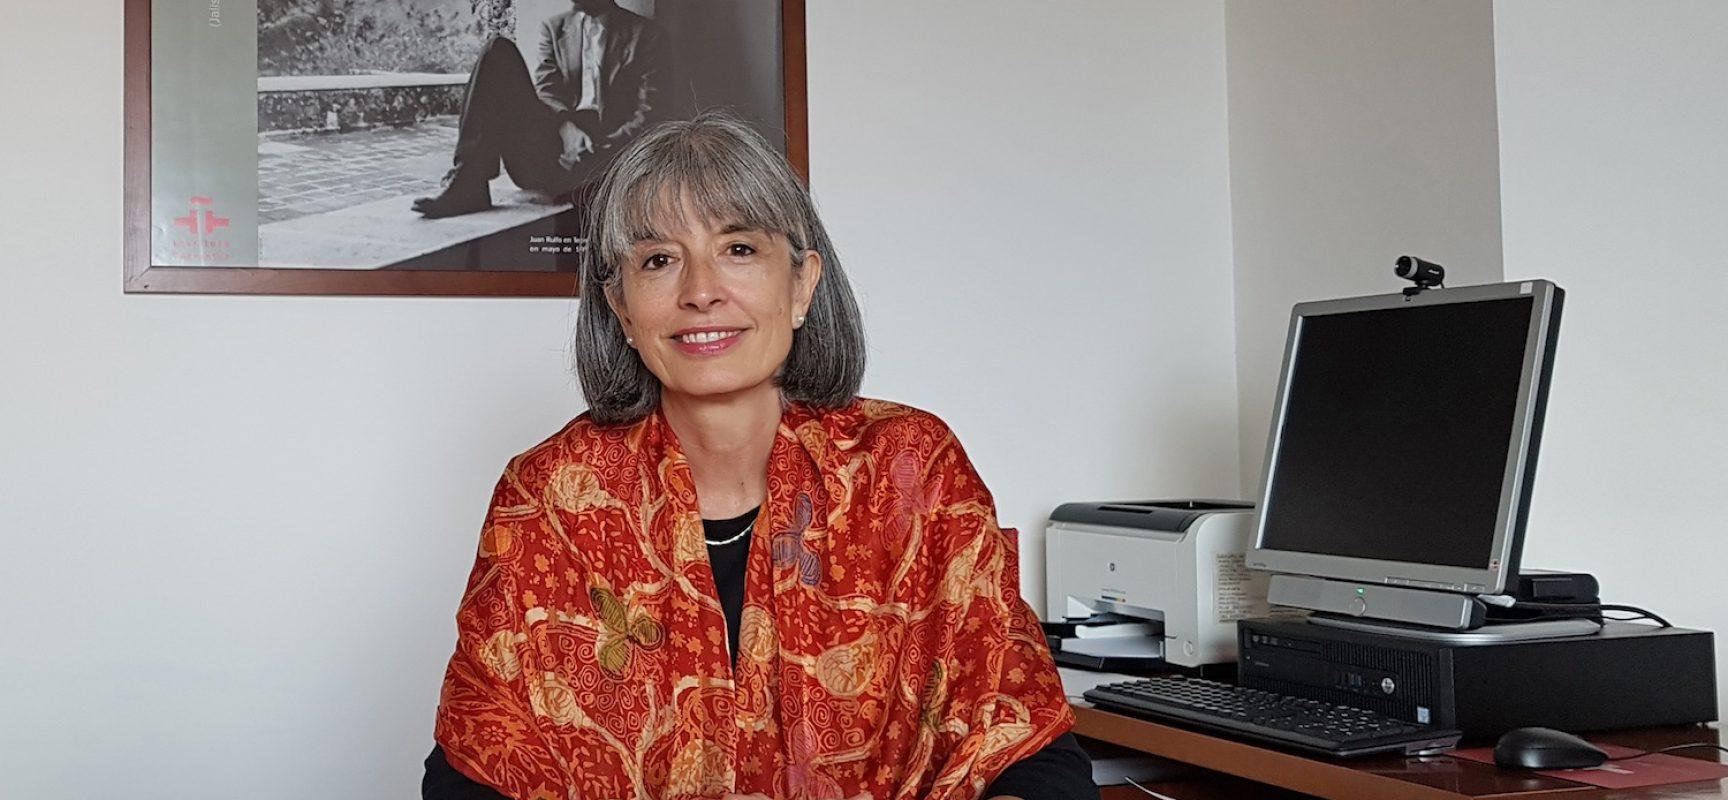 ISABEL-CLARA LORDA VIDAL a INSTITUTO CERVANTES